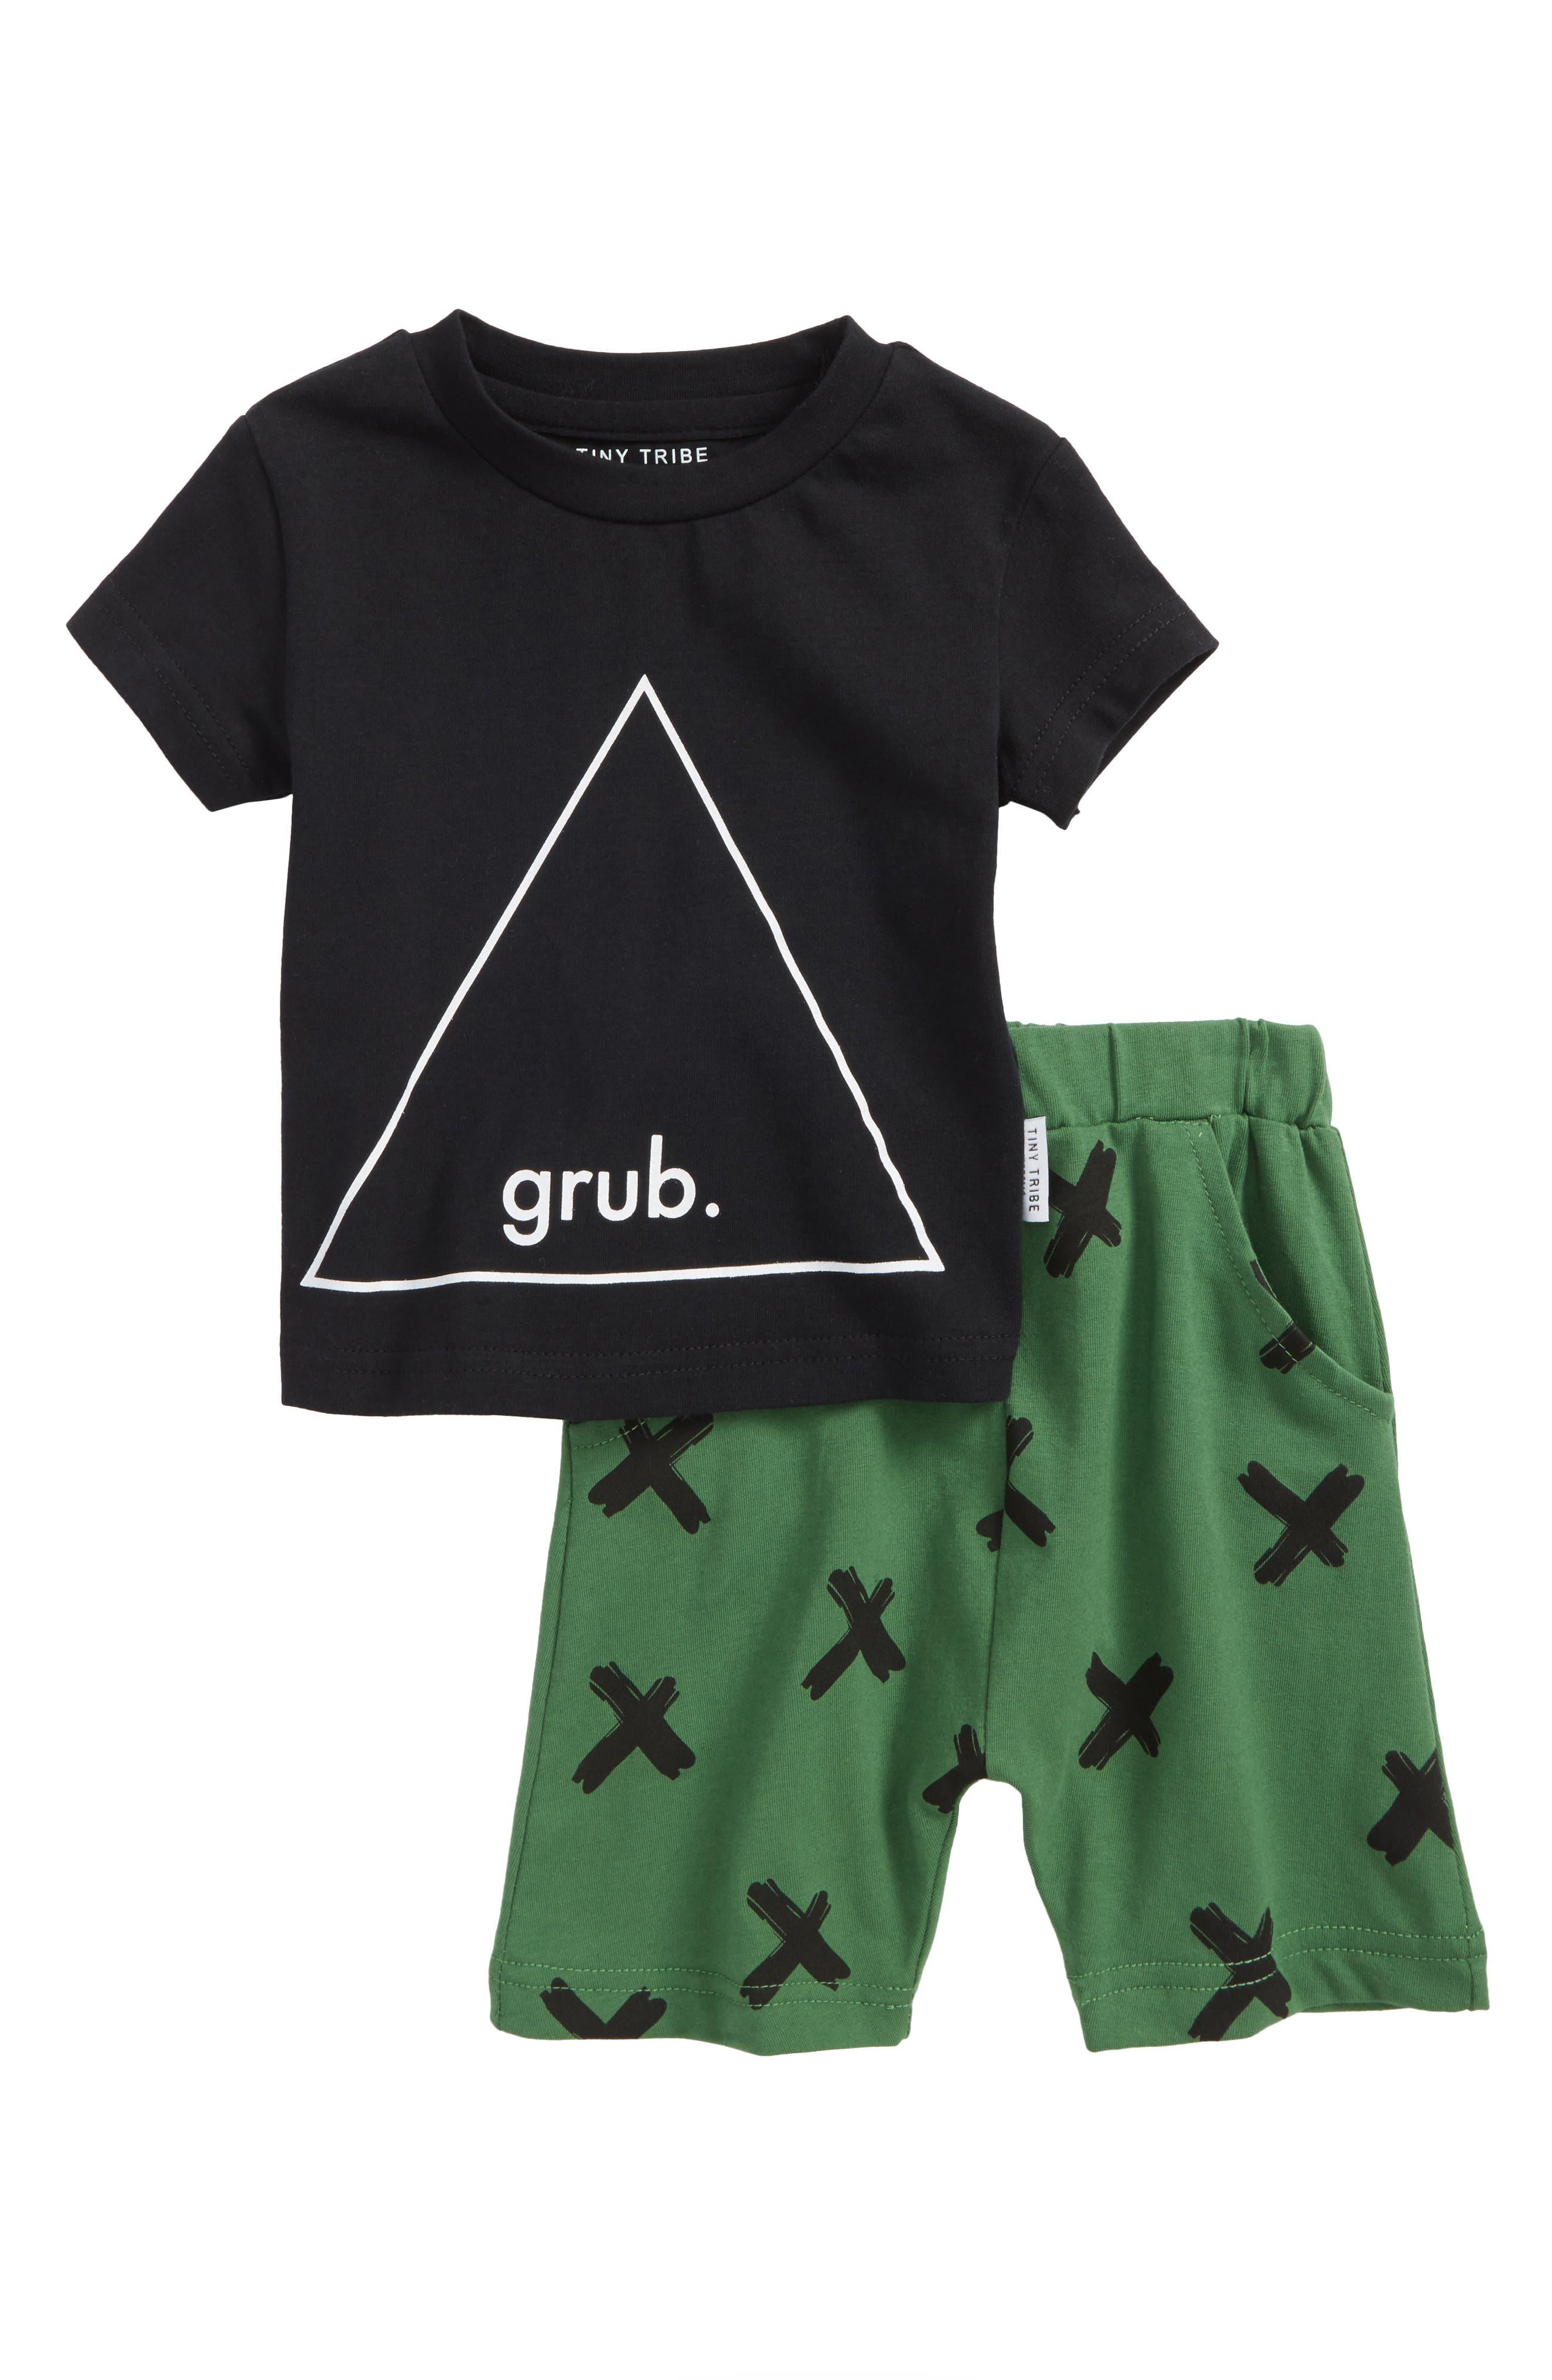 Tiny Tribe Grub T-Shirt & Shorts Set (Baby Boys)